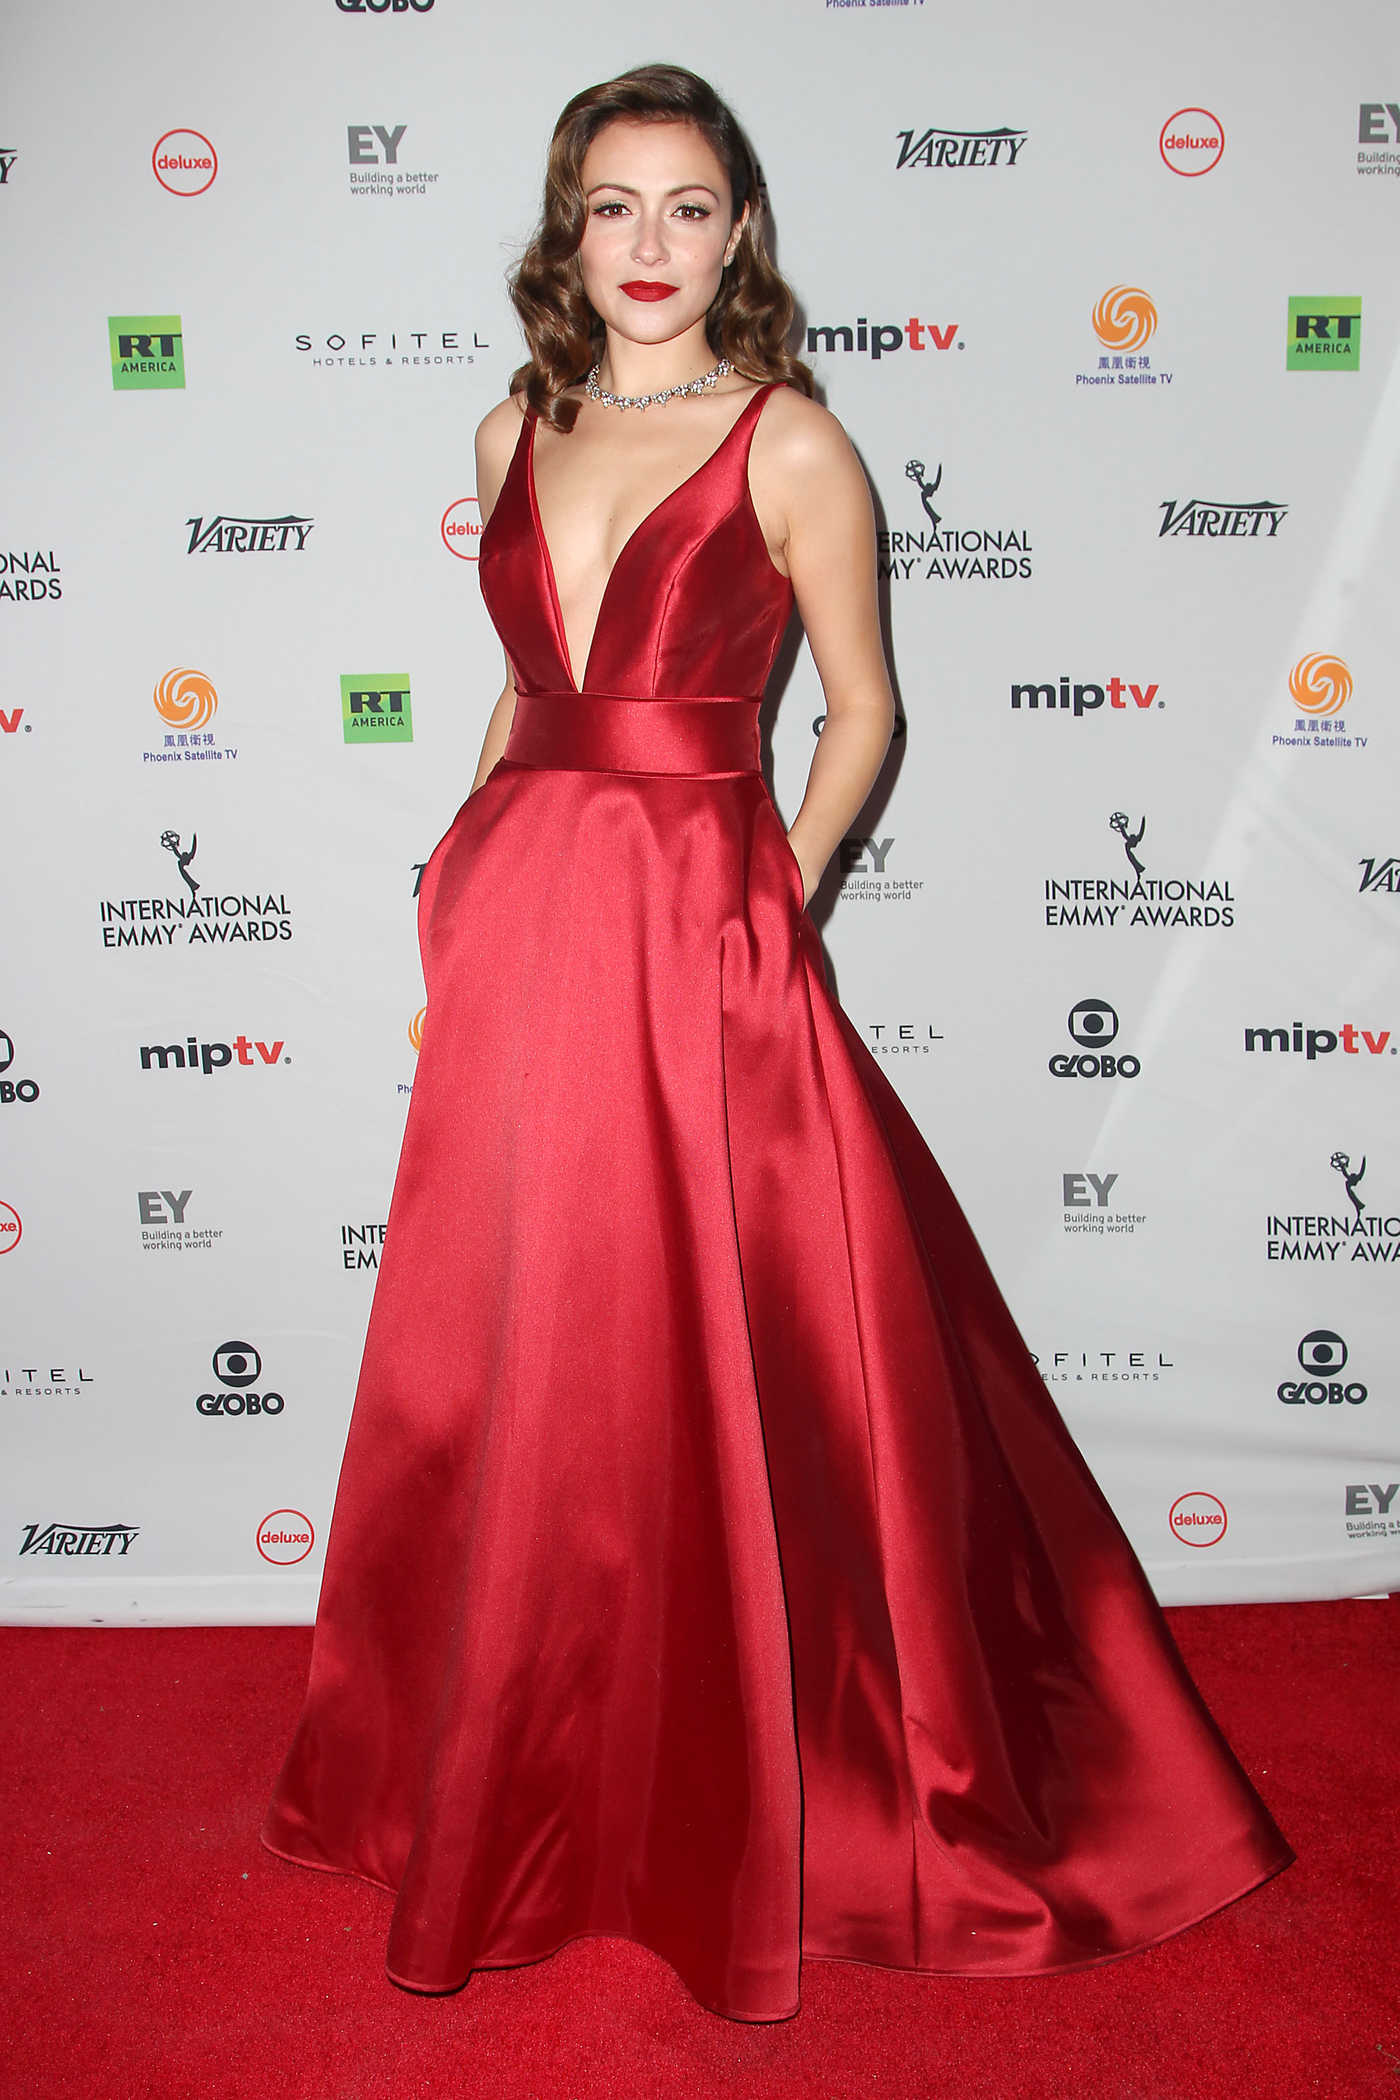 Italia Ricci at the 45th International Emmy Awards Gala at the New York Hilton Hotel in New York City 11/20/2017